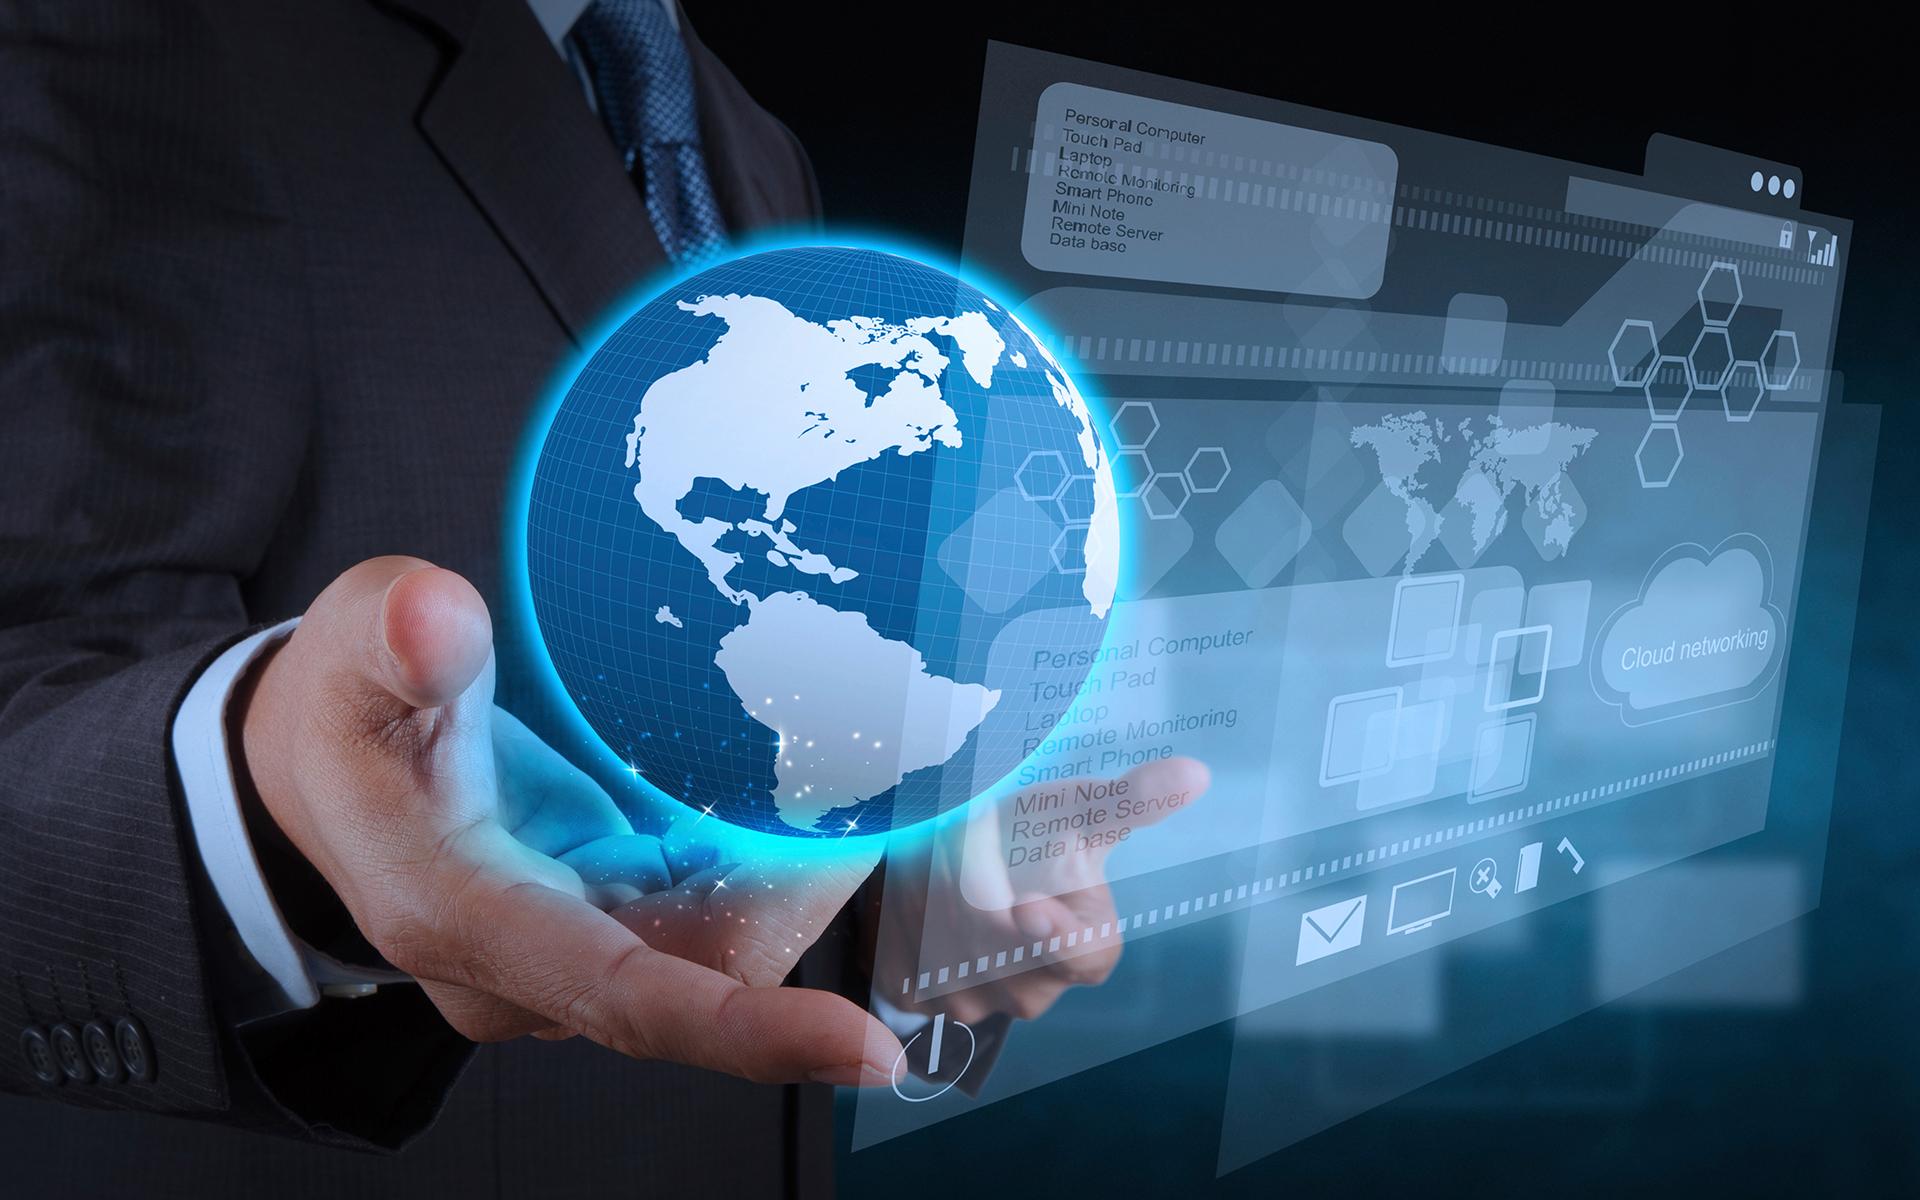 The best wireless internet services provider photo